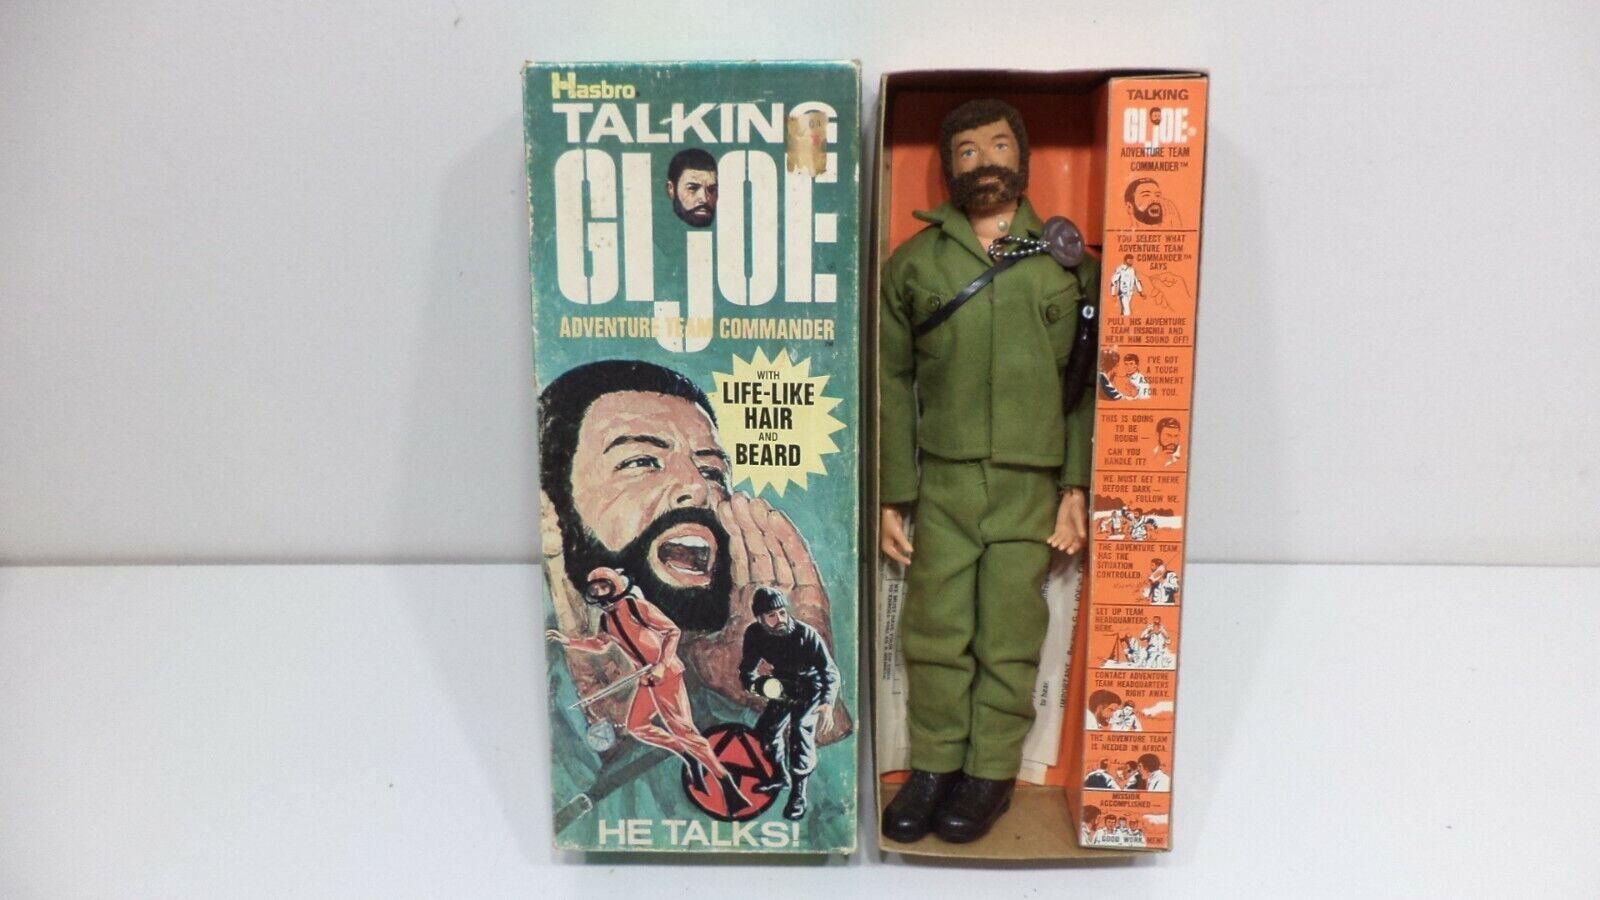 Vintage Talking G.I. Joe - Adventure Team Commander in Box - Hasbro 1970